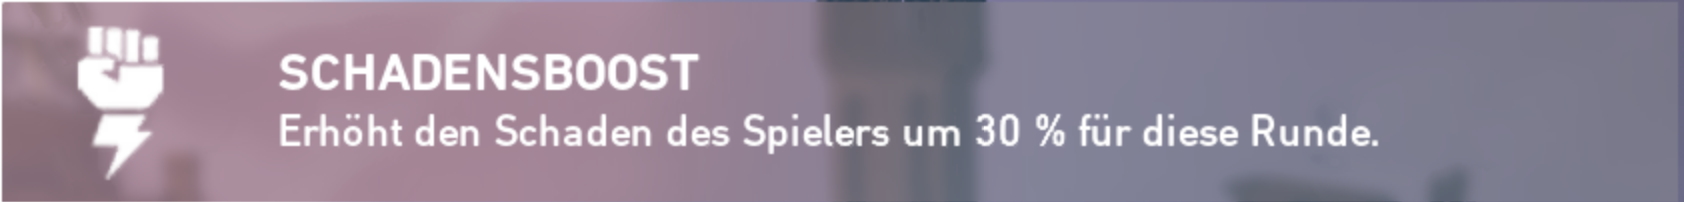 Valorant Spielmodi Spike-Ansturm Schadensboost - Haton.net